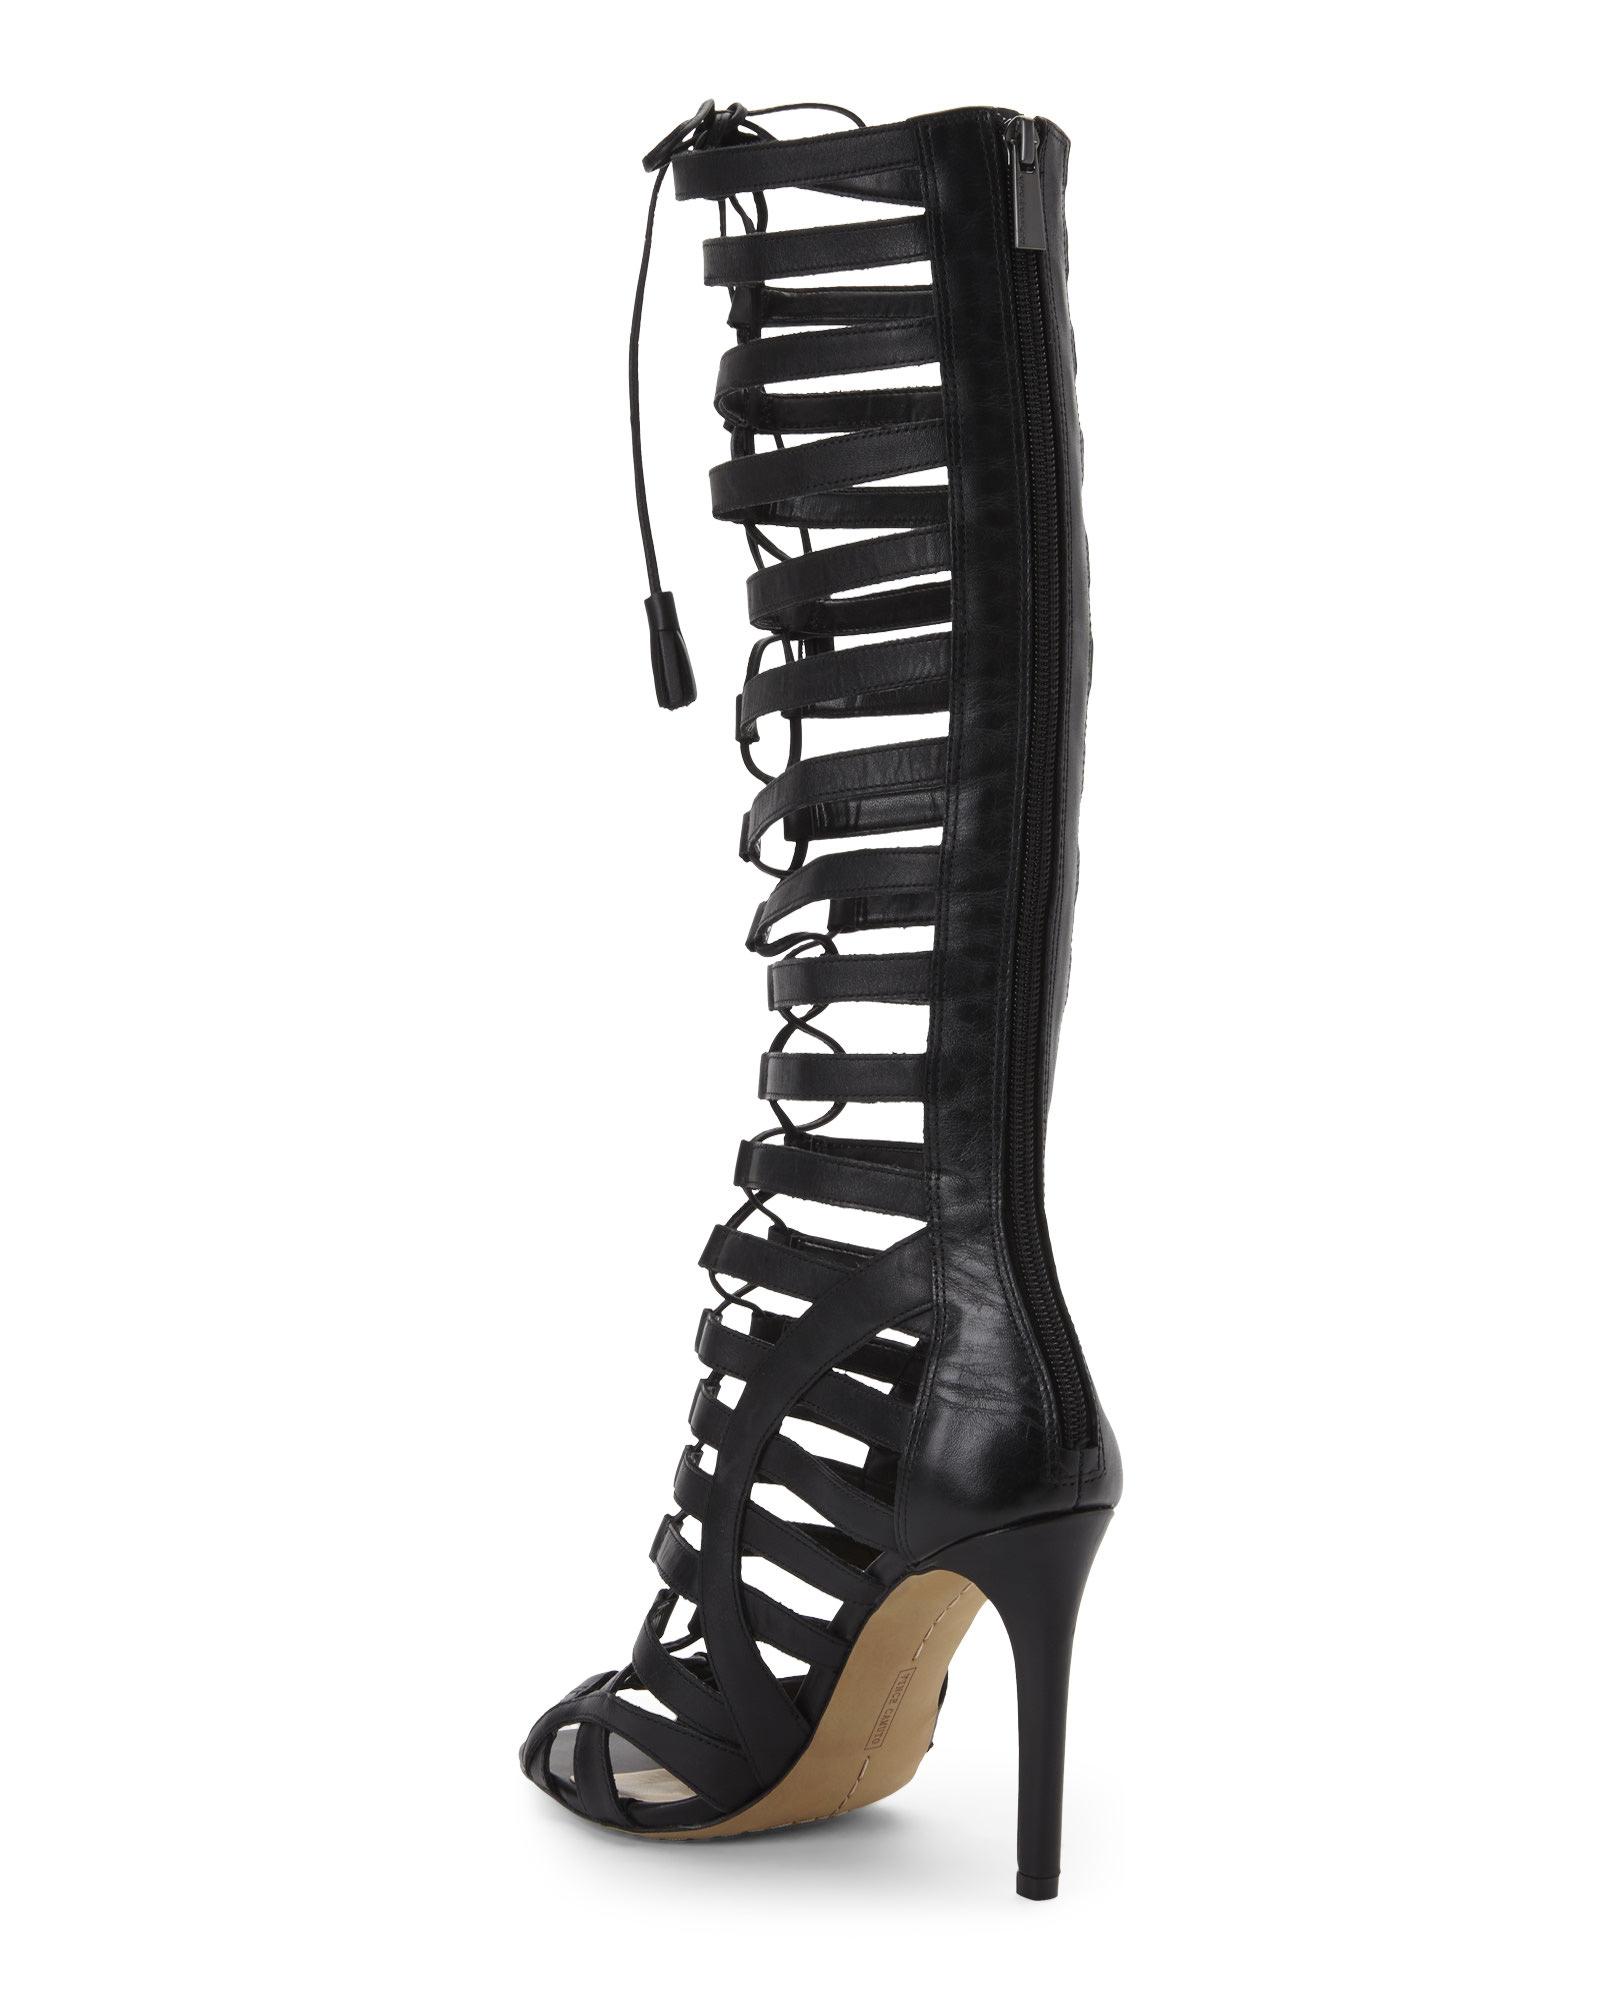 Vince Camuto Leather Black Olivian Gladiator Sandals Lyst